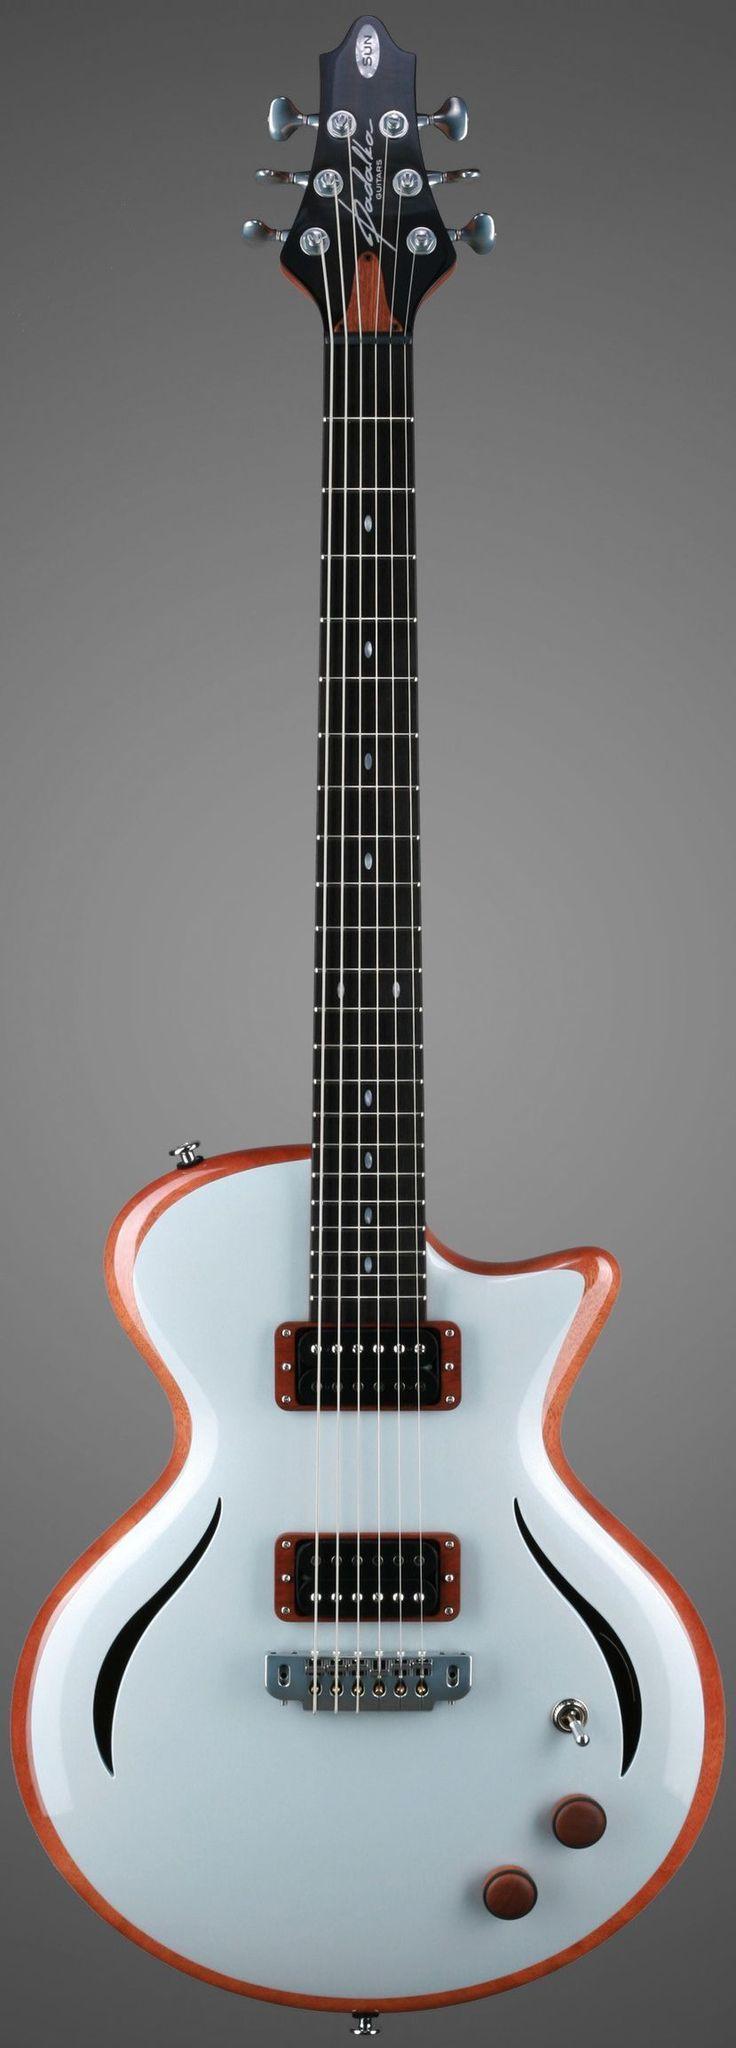 374 best guitars images on Pinterest | Electric guitars, Fender ...